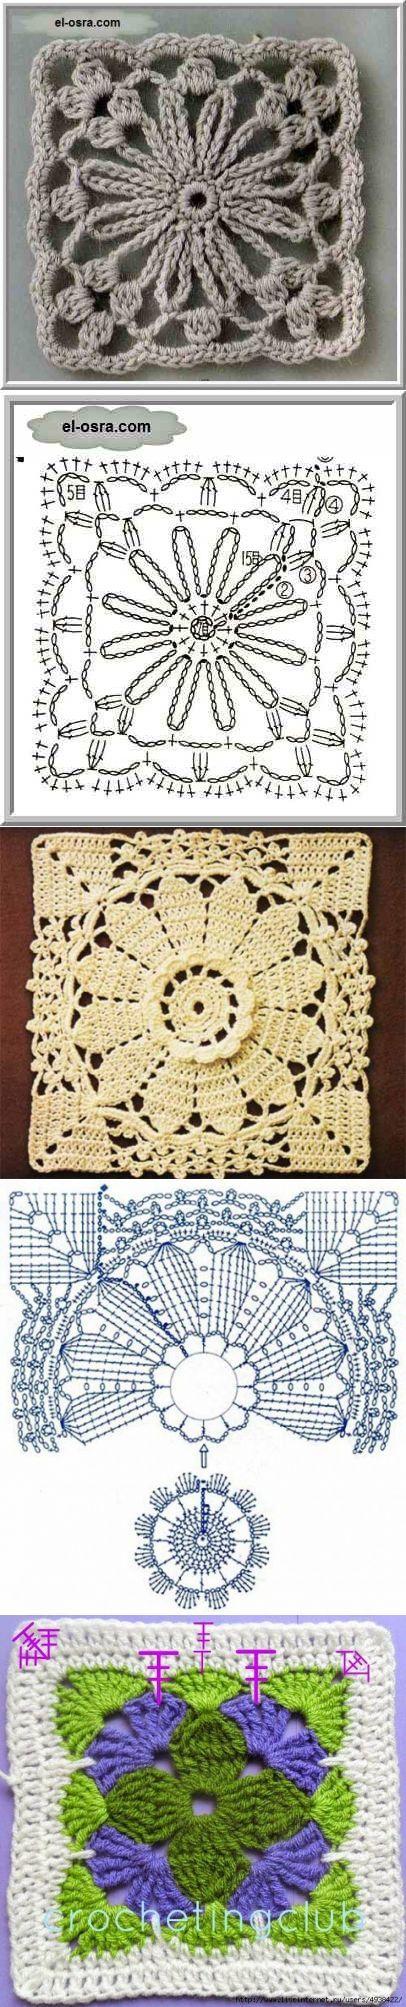 вязание крючок | kalakendra | Pinterest | Ganchillo, Tejido y Cuadrados